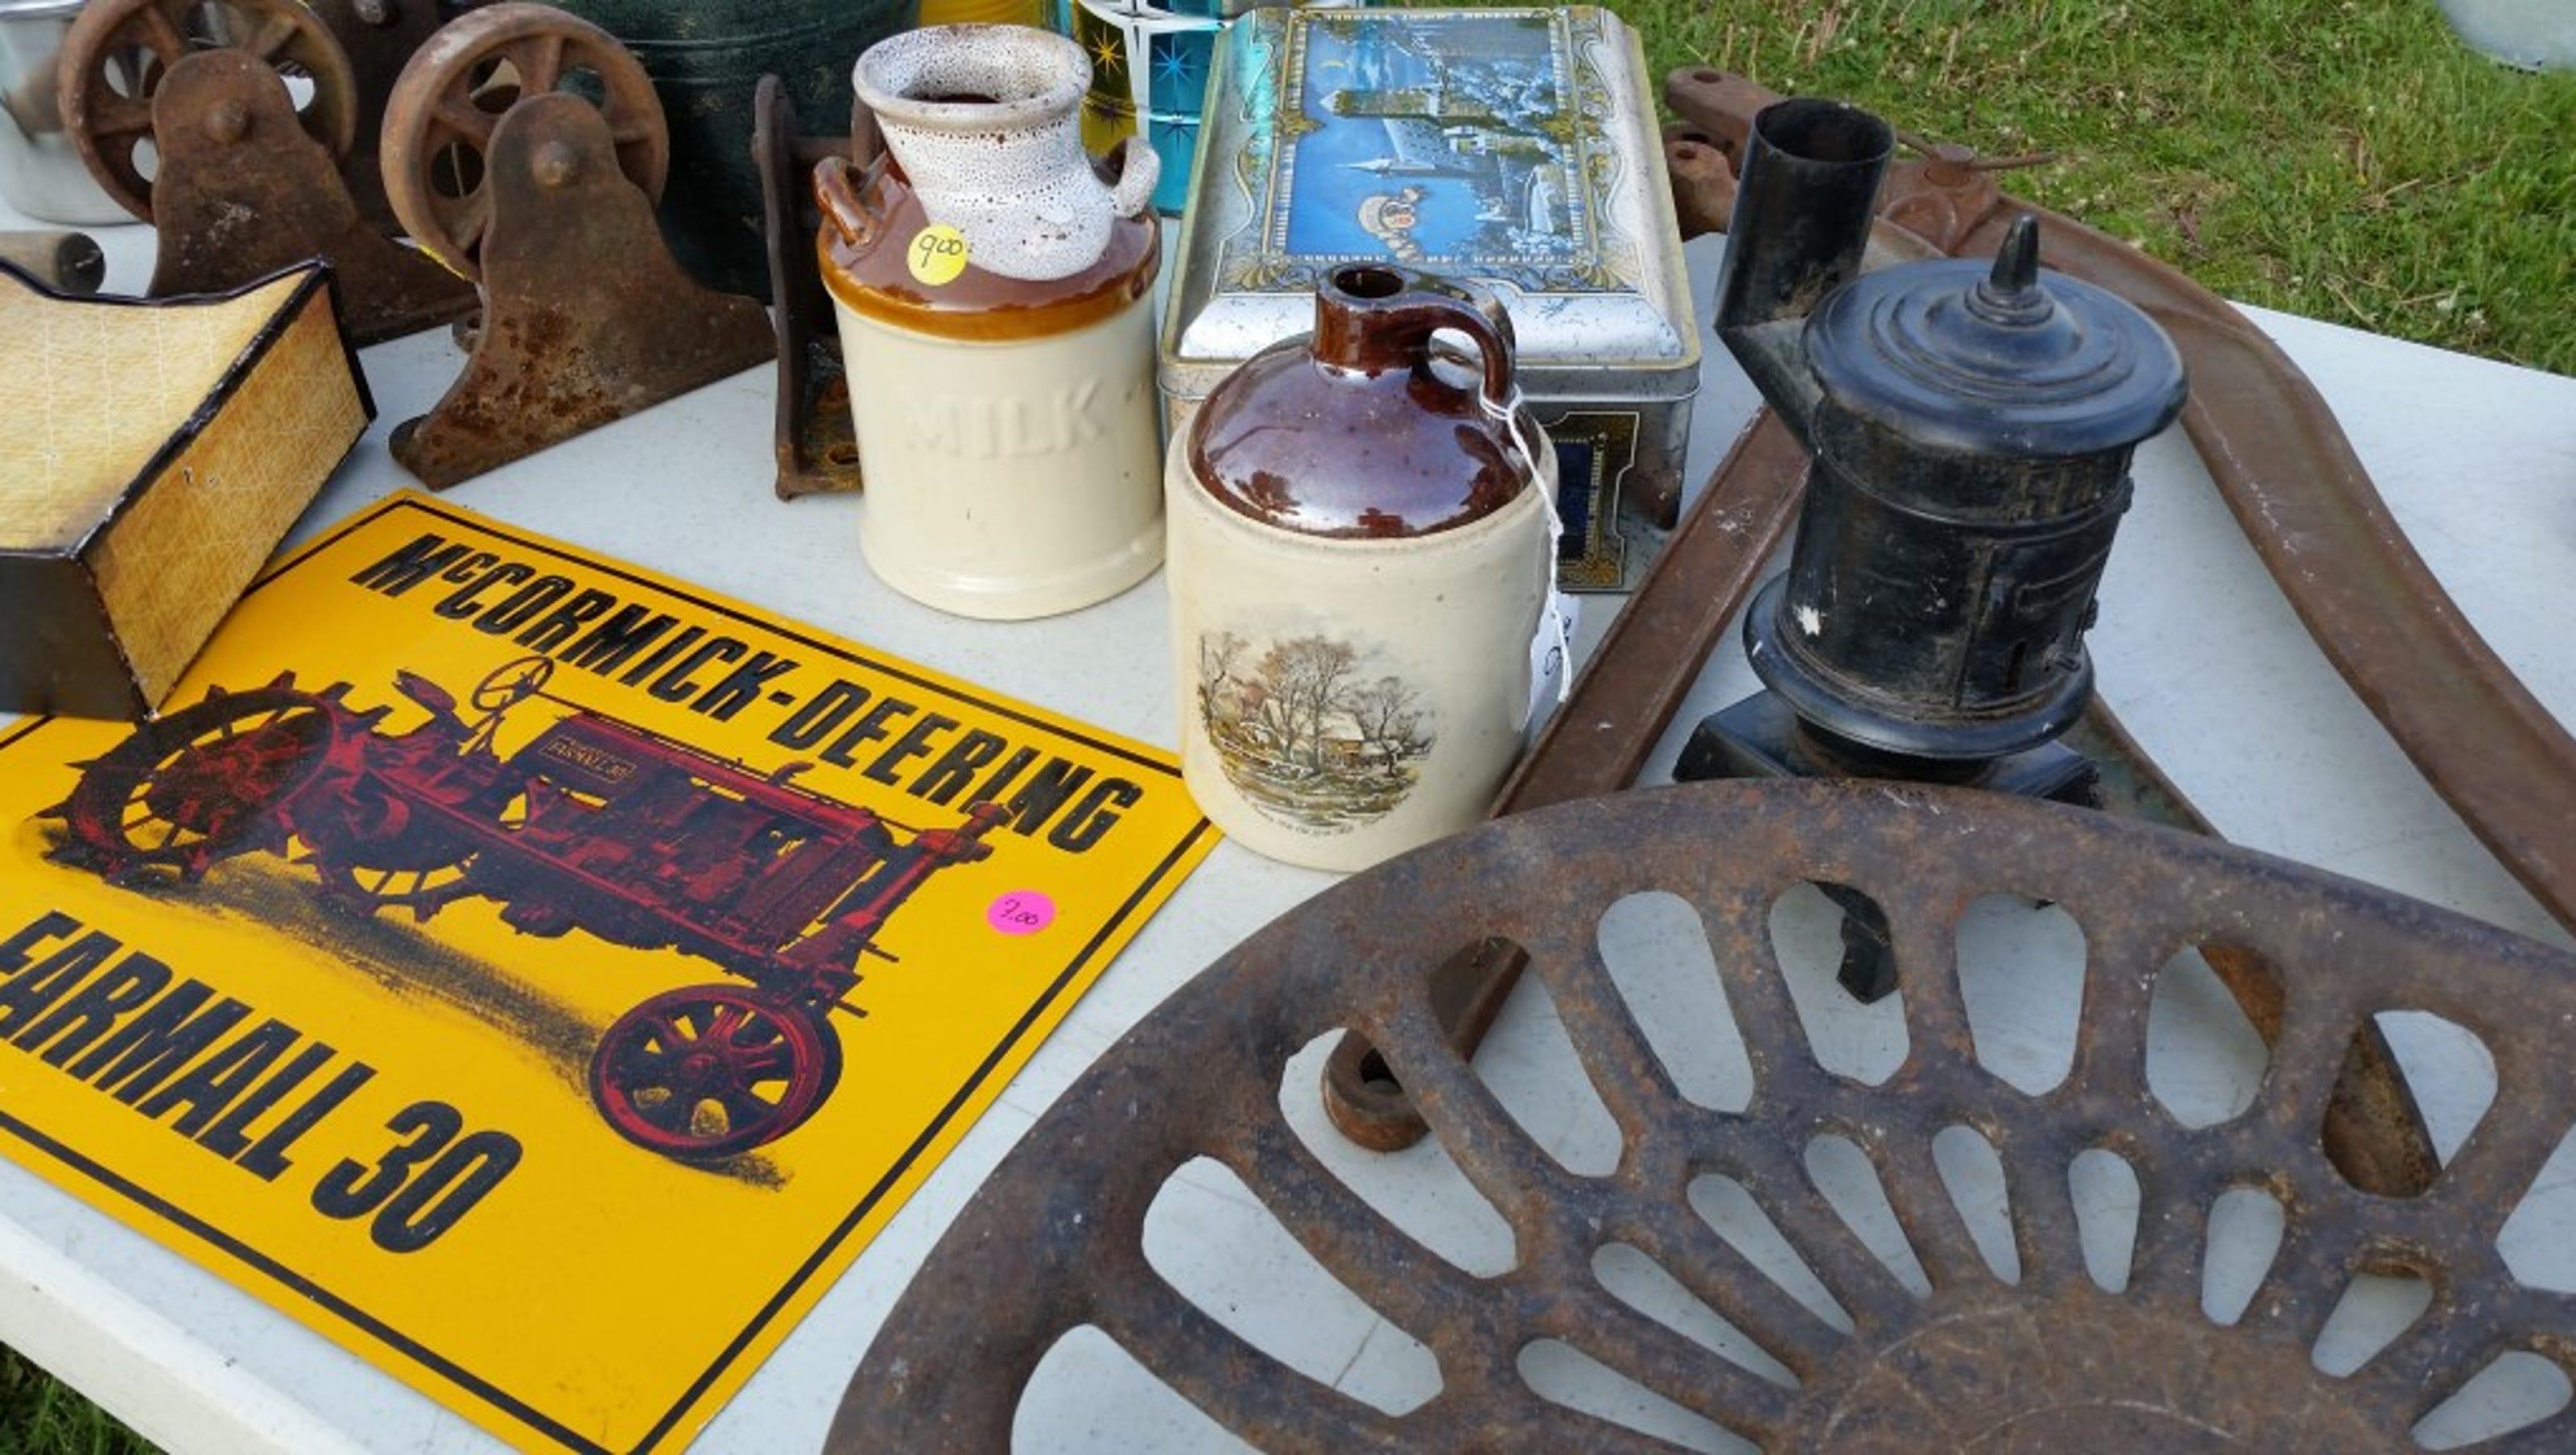 Dodge County flea market craft fair showcases additional vendors